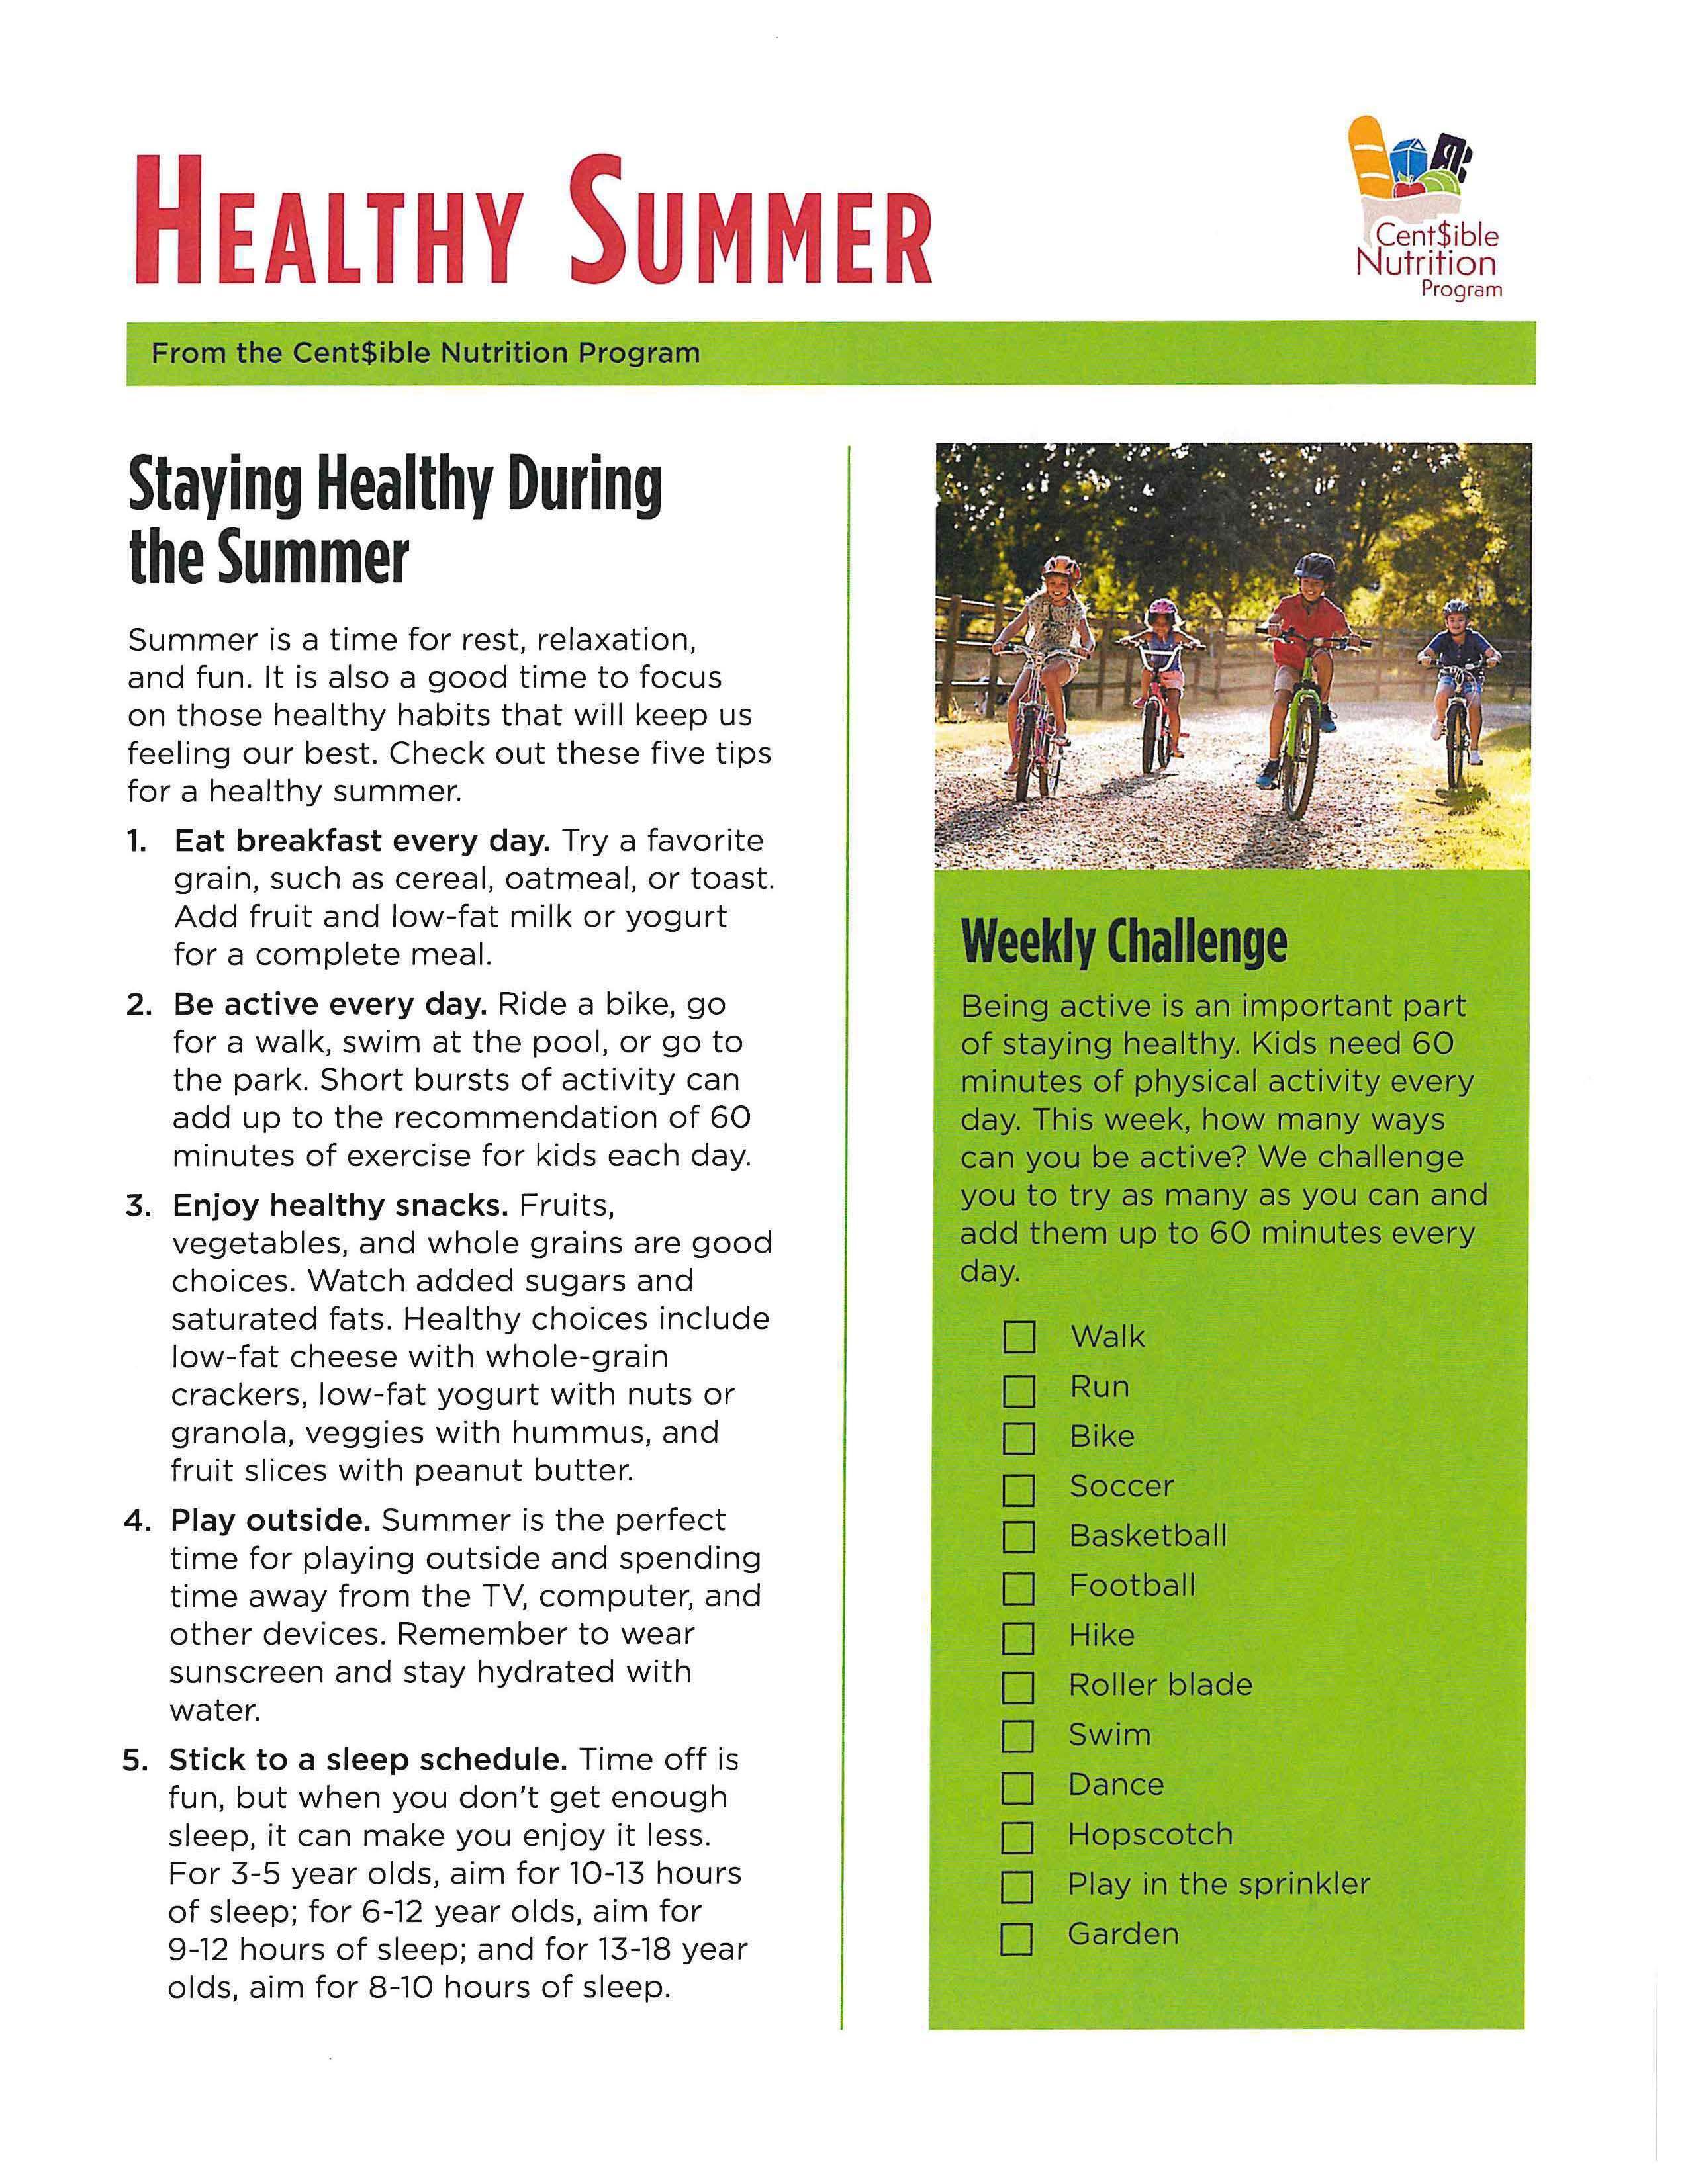 Healthy Summer flyer